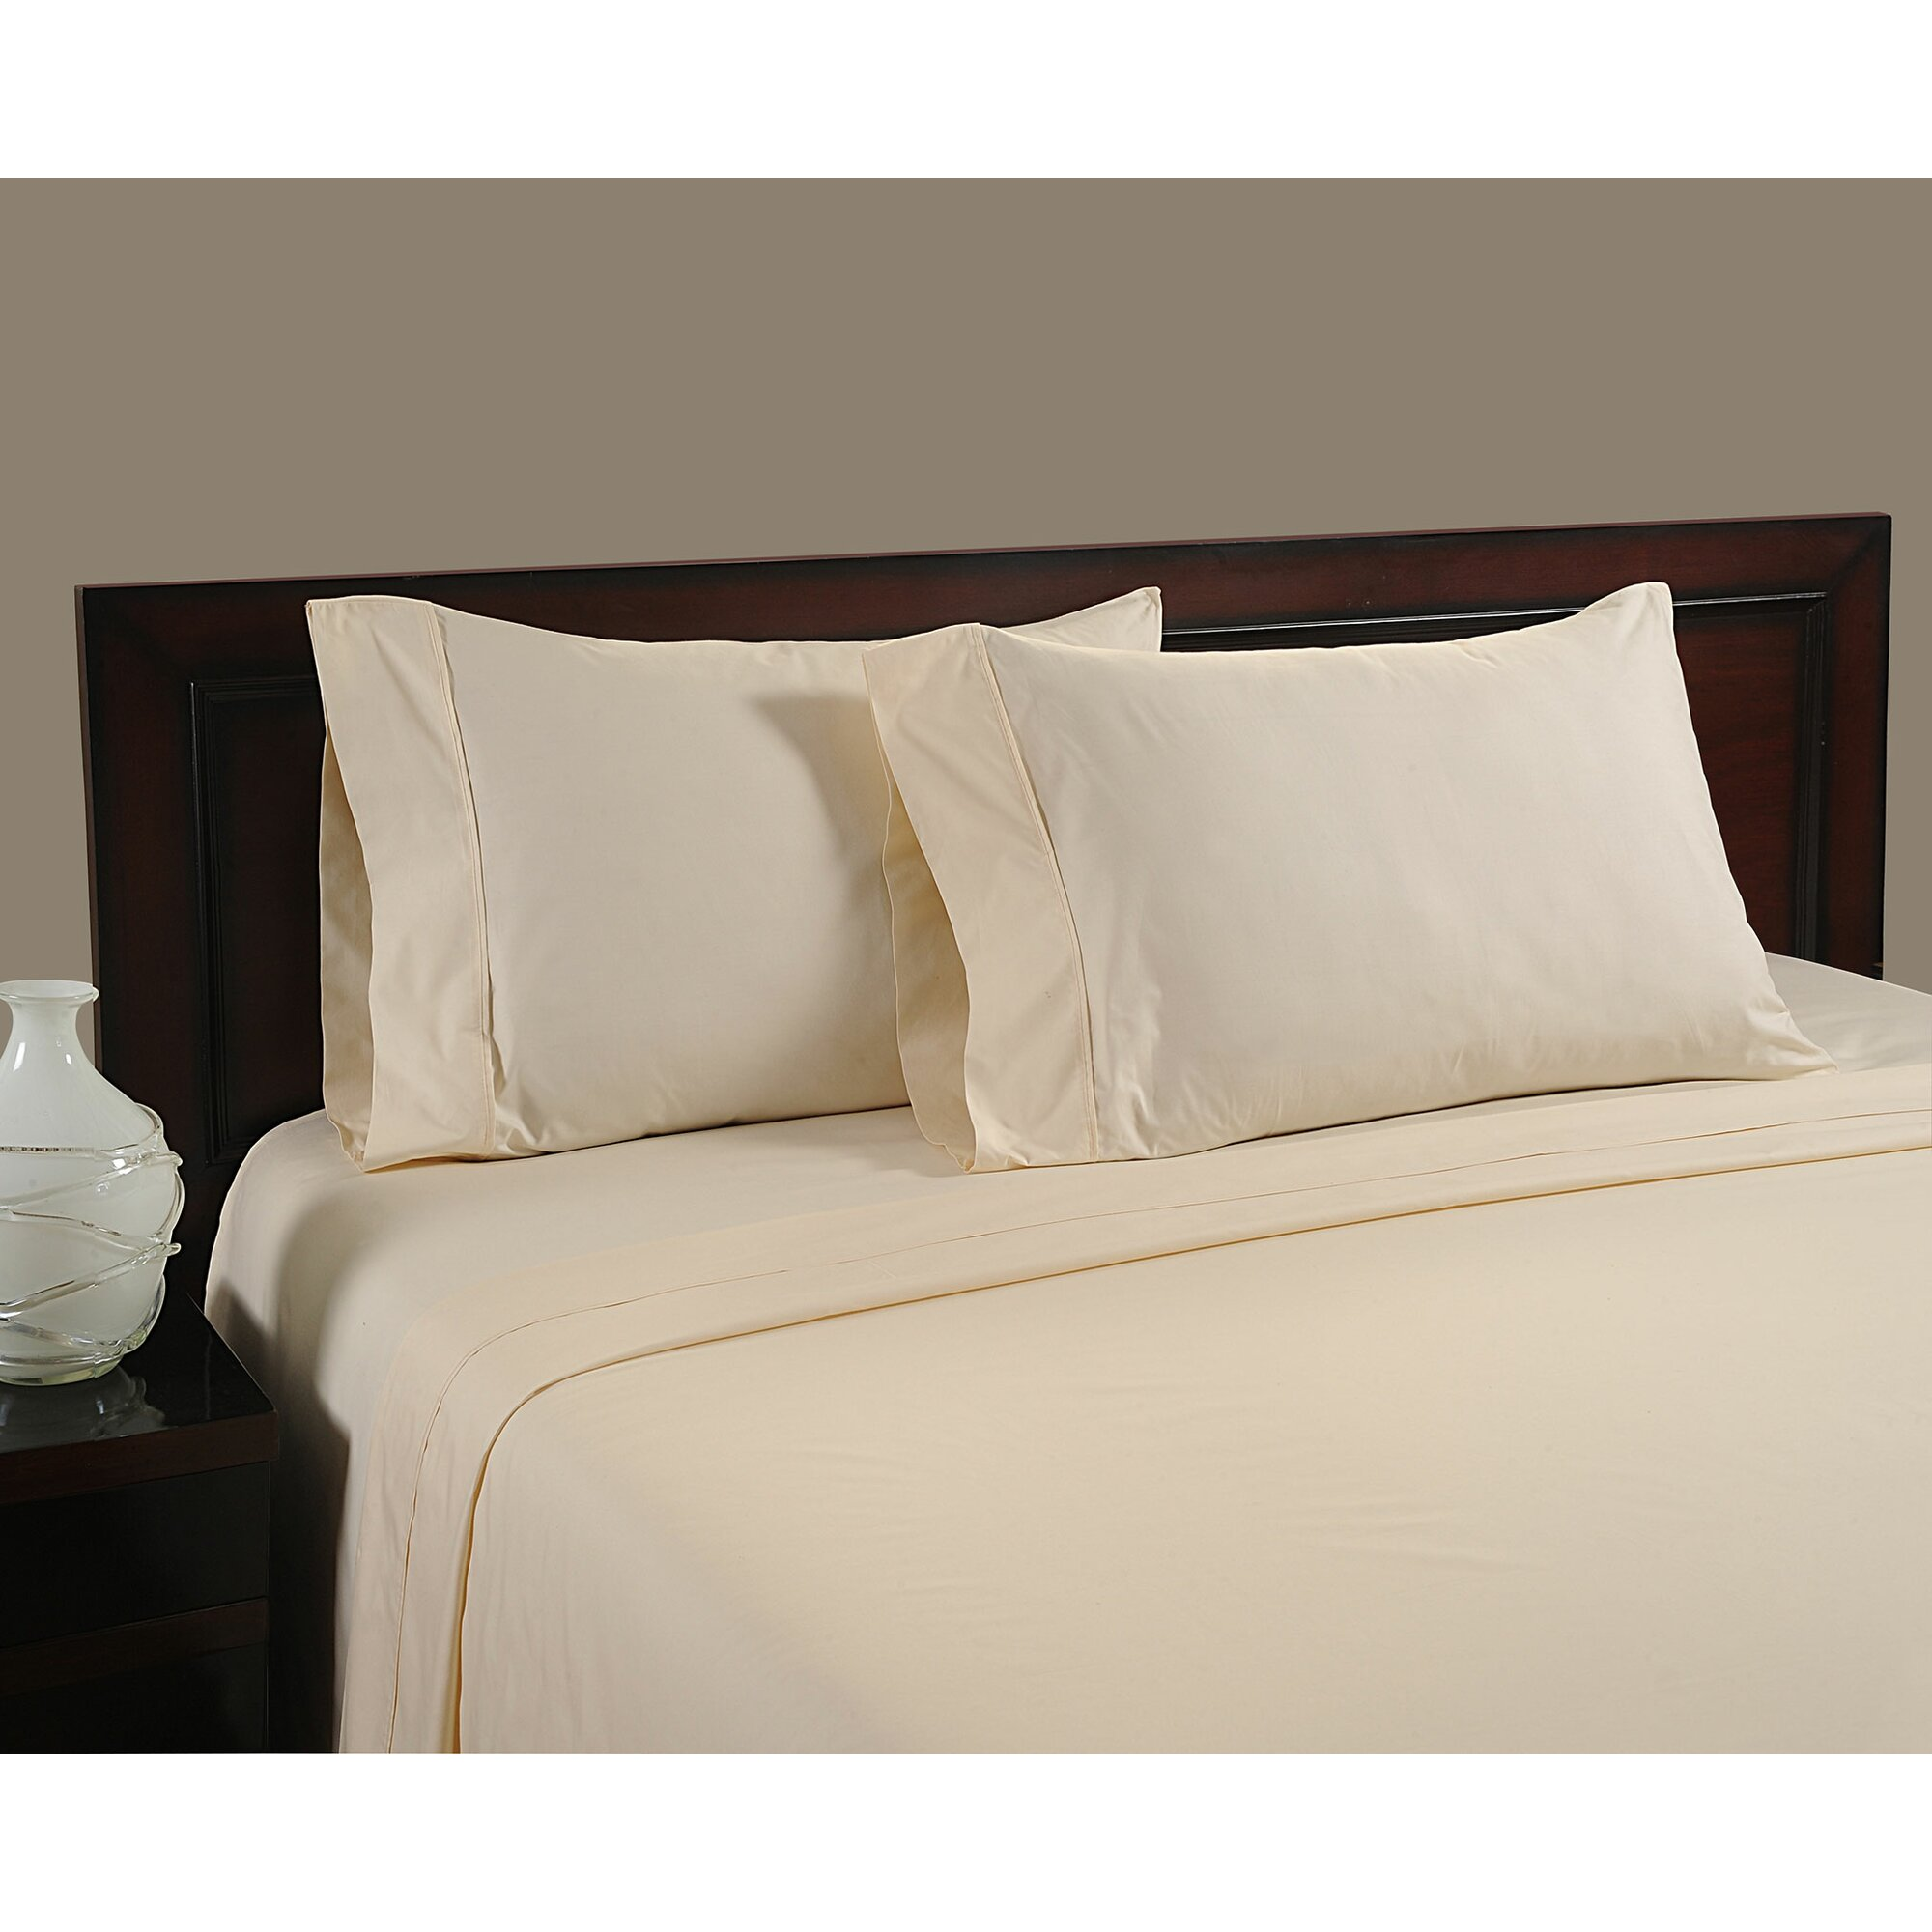 color sense cool touch 400 thread count cotton sheet set reviews wayfair. Black Bedroom Furniture Sets. Home Design Ideas